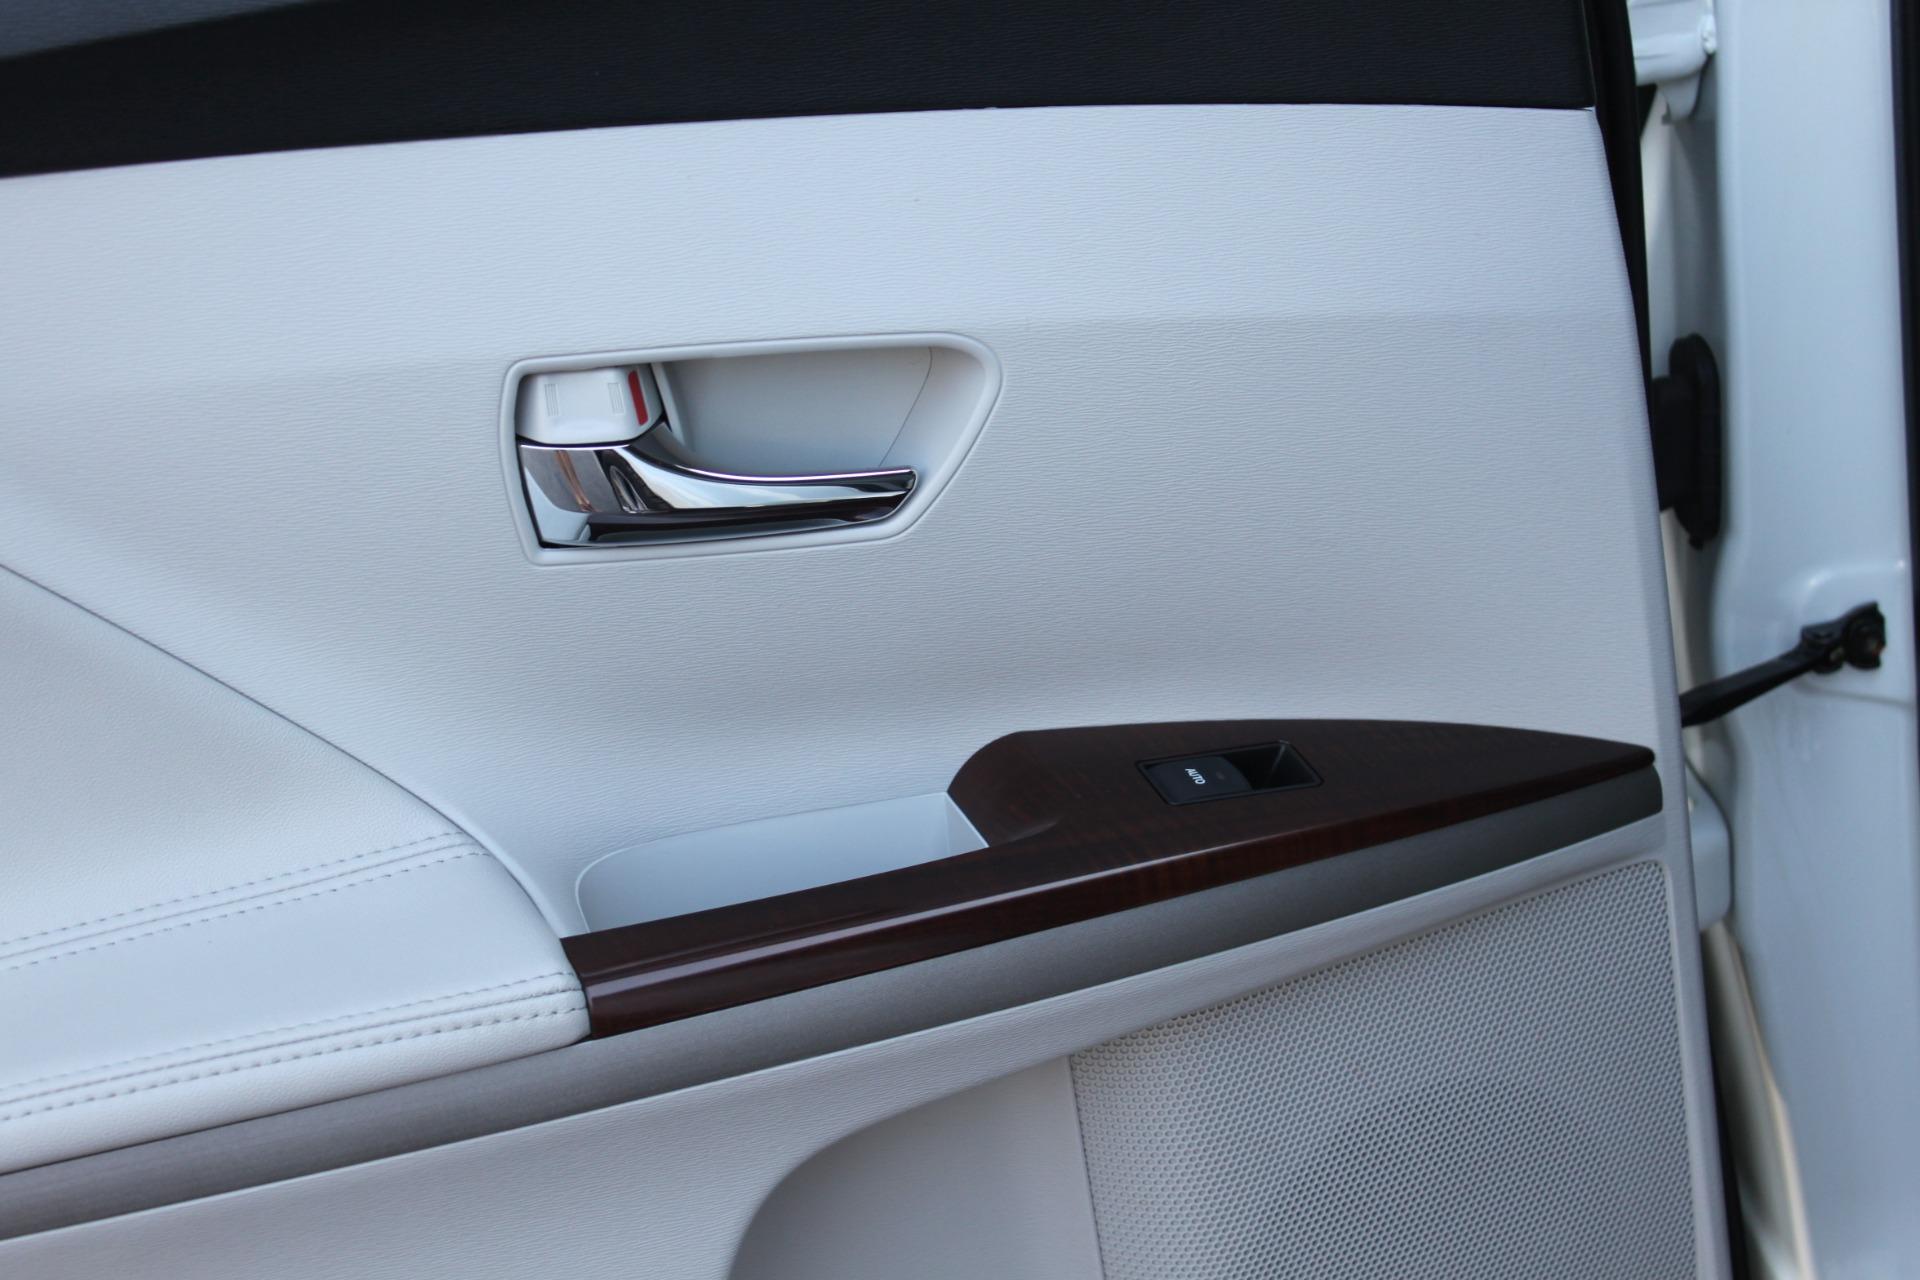 Used-2012-Toyota-Venza-XLE-Wrangler